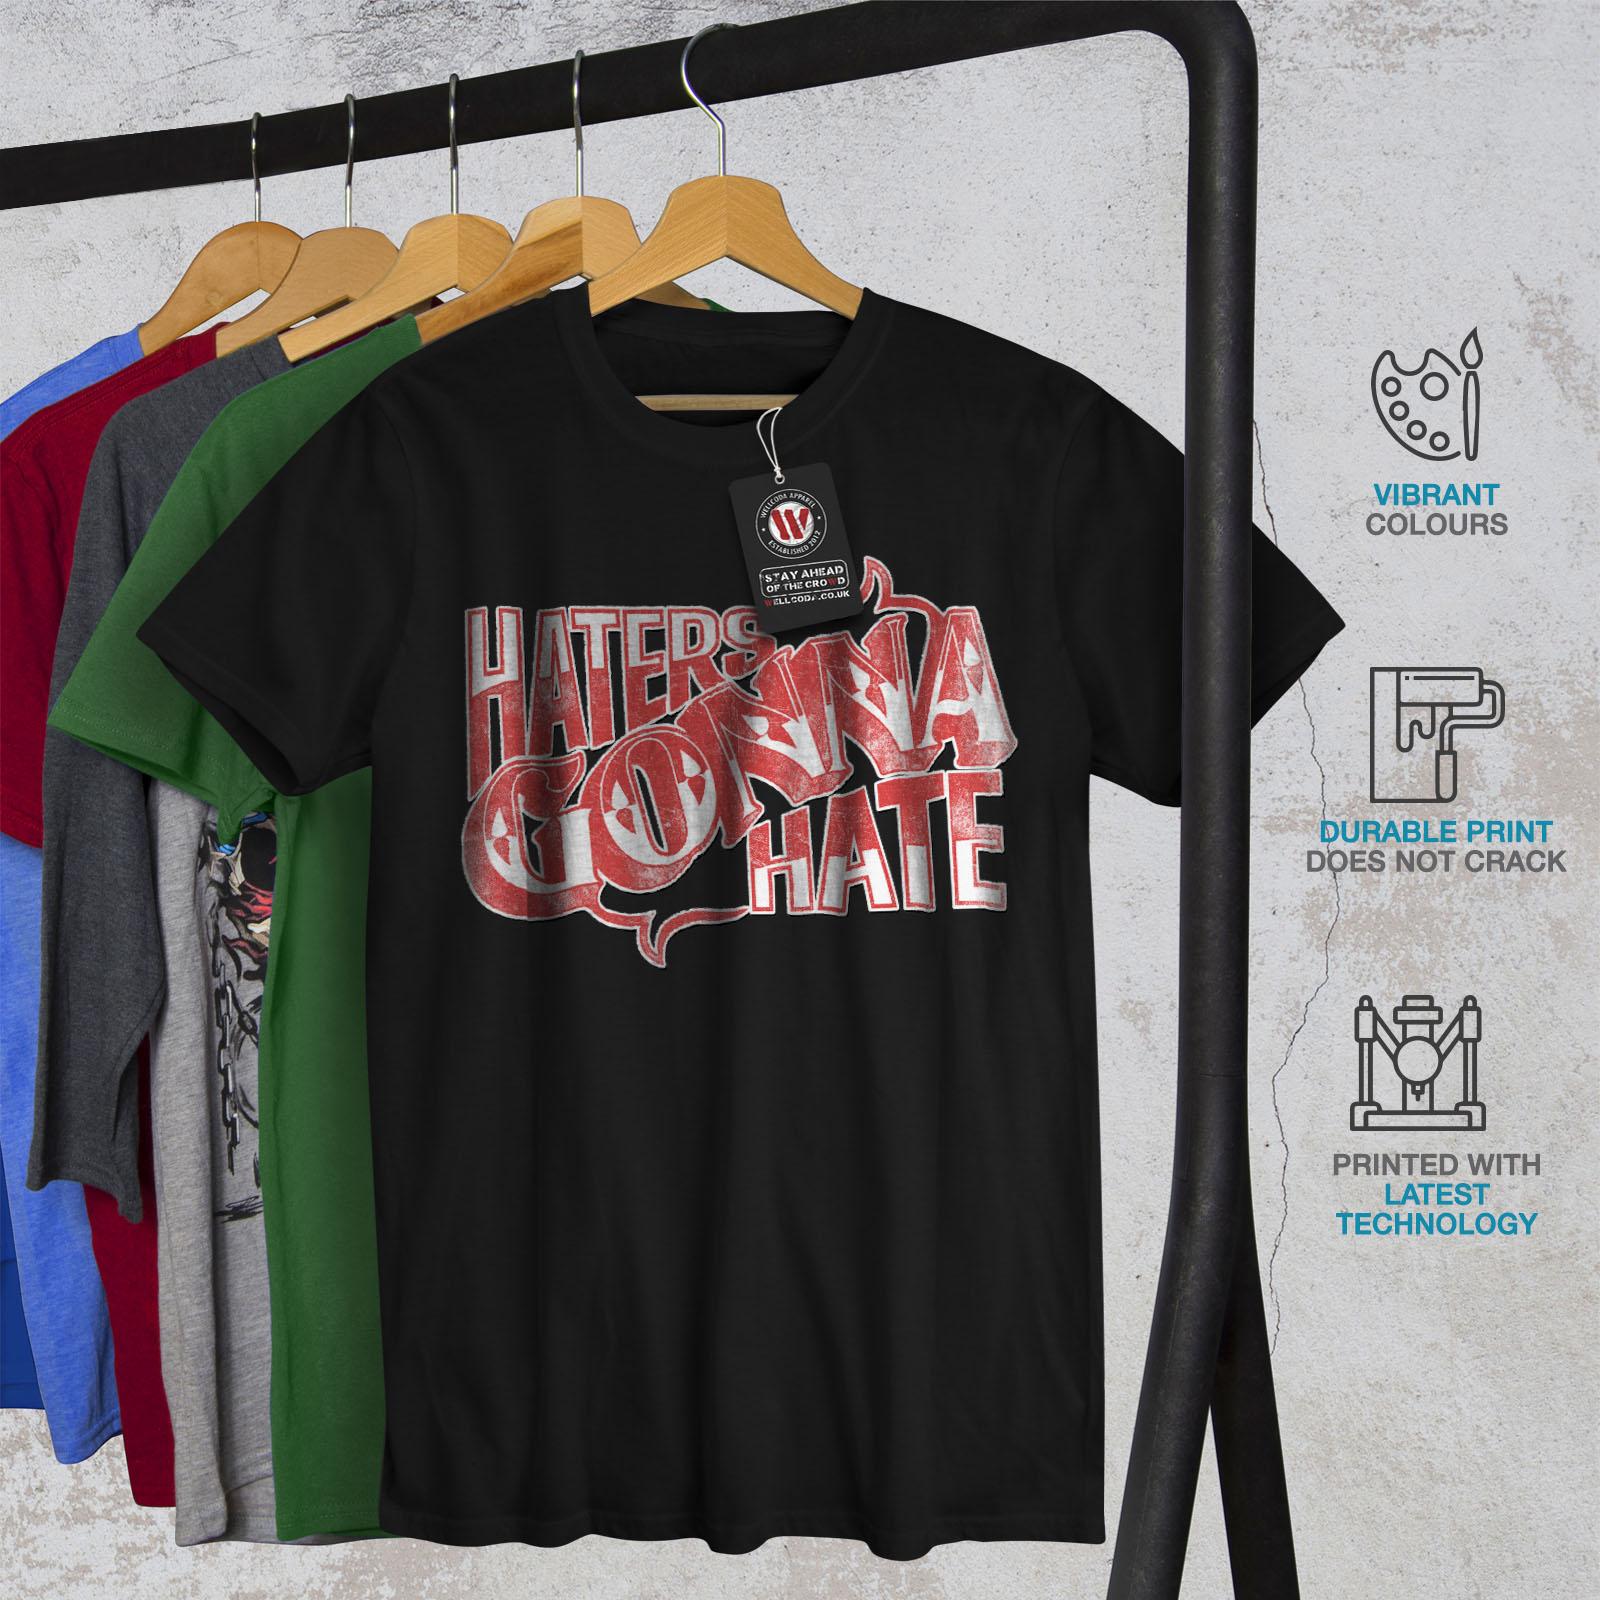 Wellcoda-Wasser-hassen-Zitat-Slogan-Herren-T-Shirt-True-Grafikdesign-Printed-Tee Indexbild 6